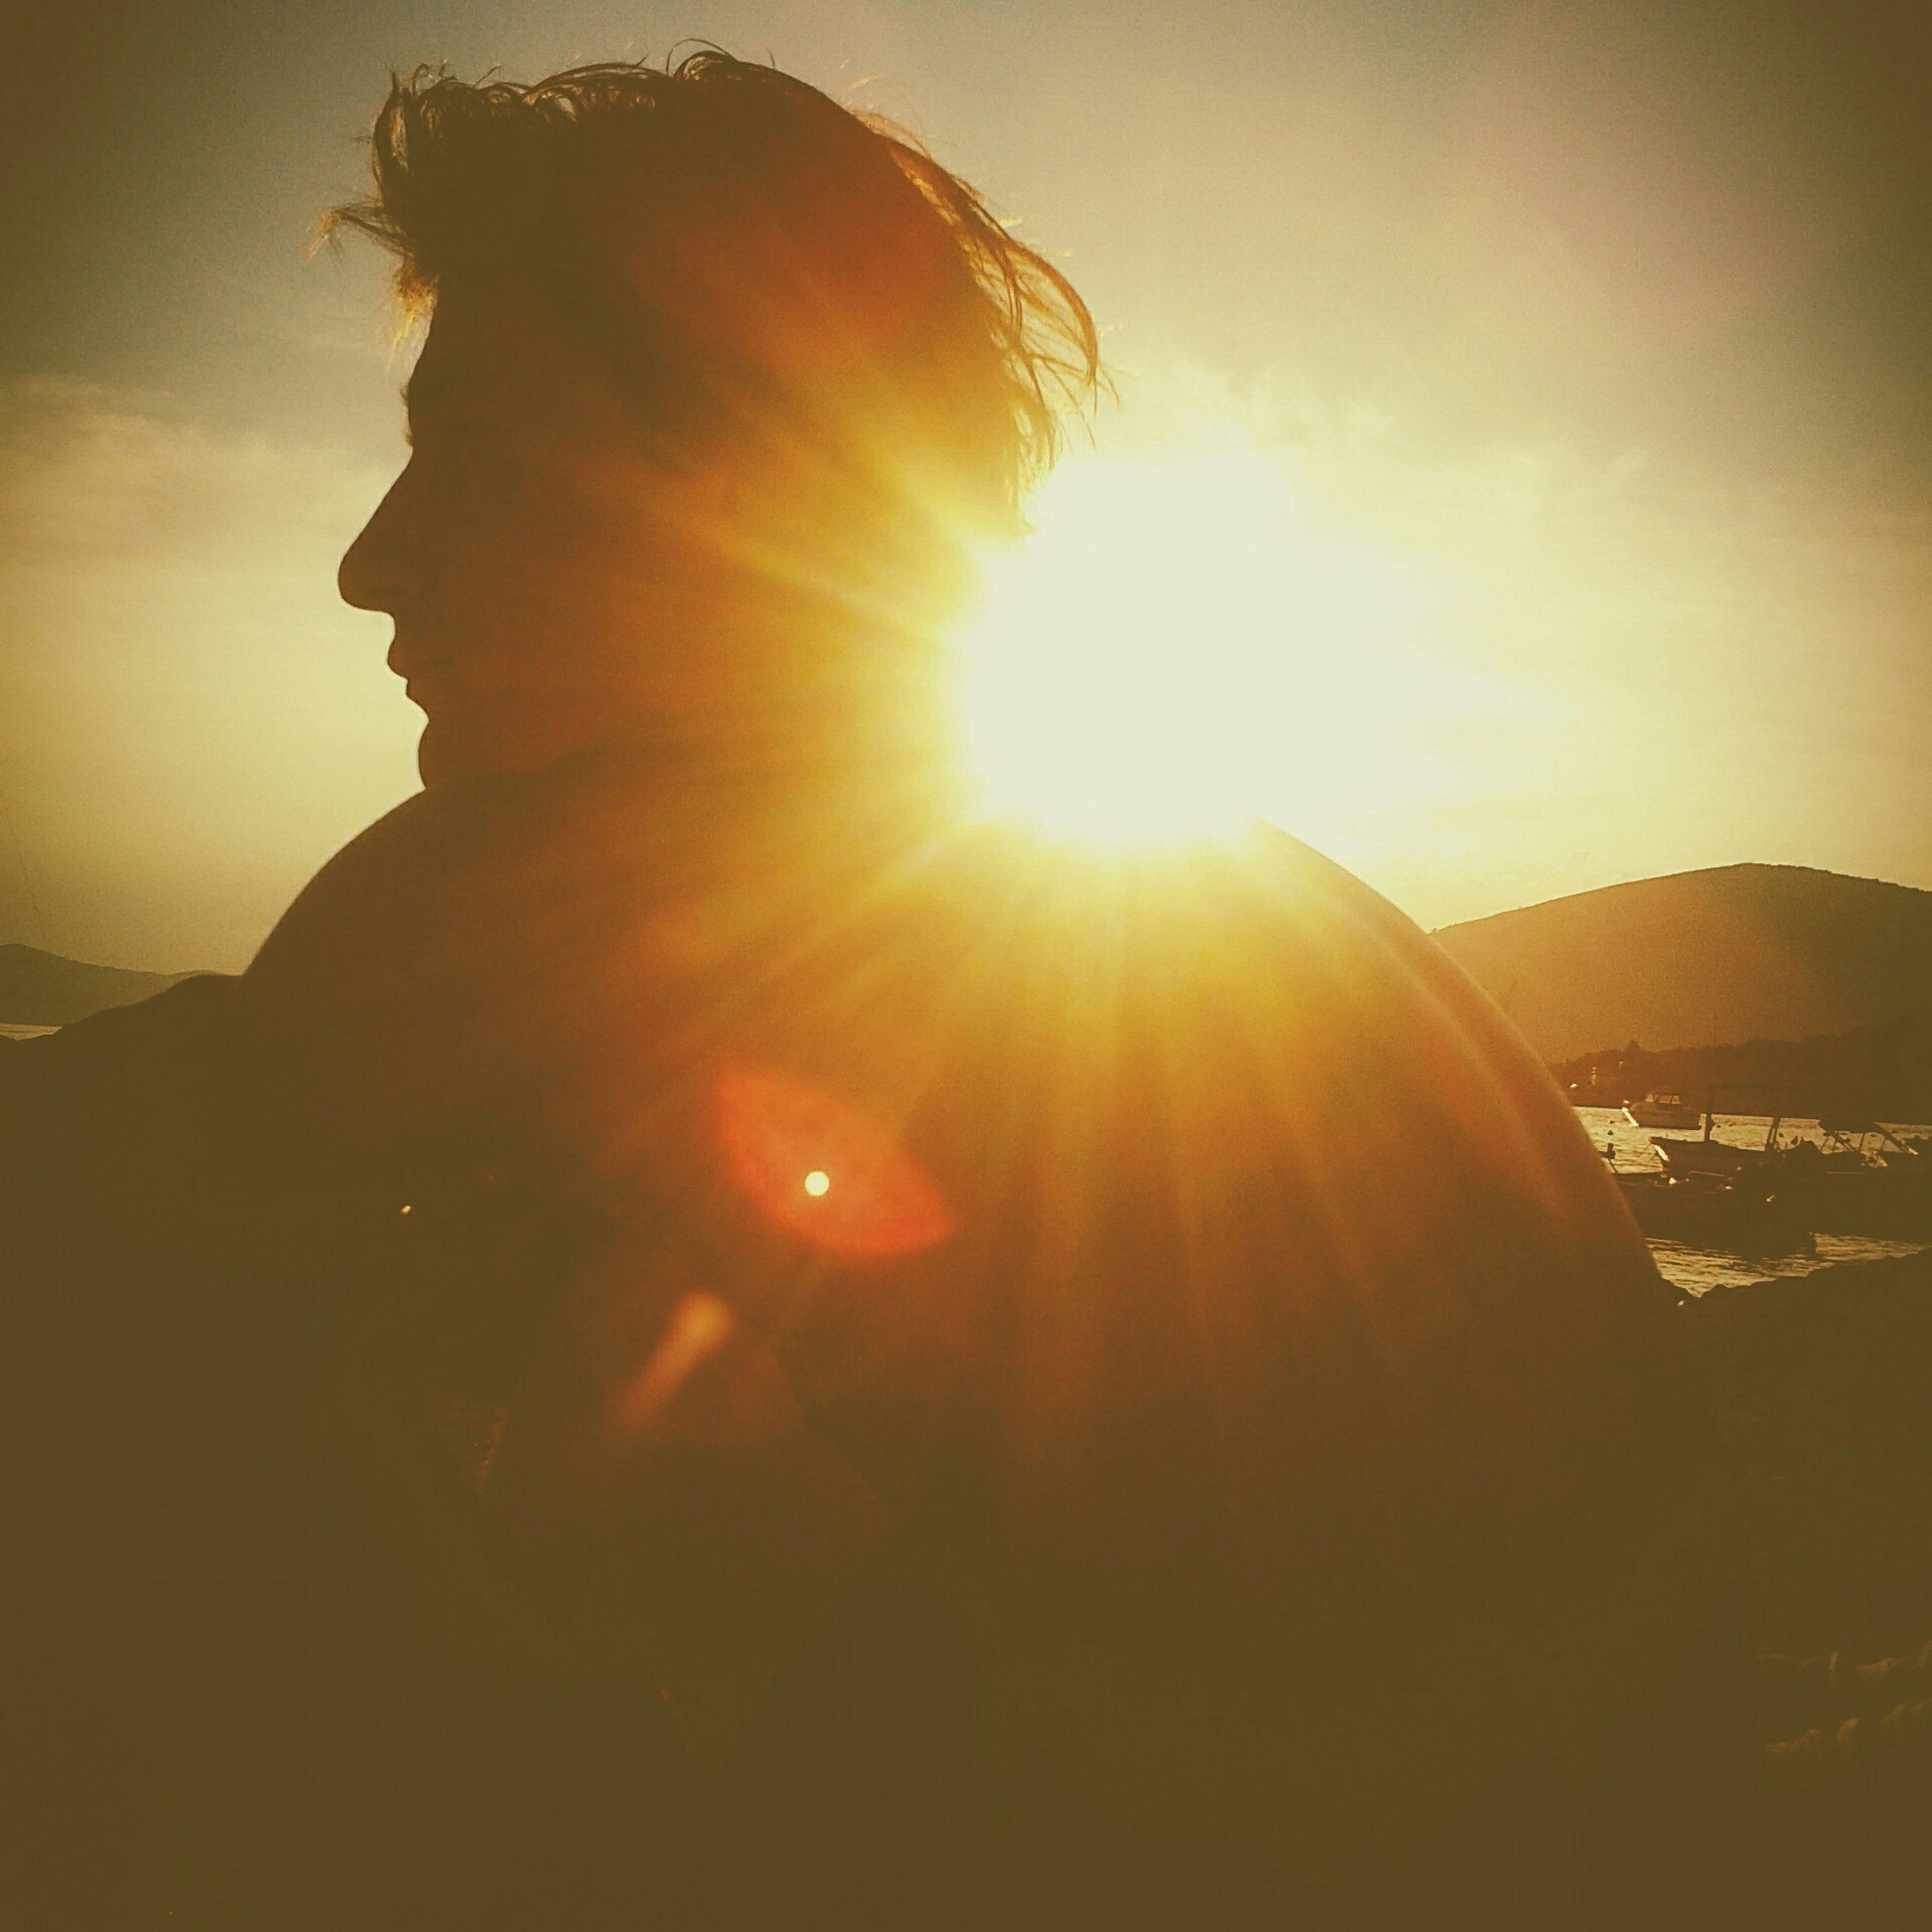 sun, sunset, sunbeam, mountain, sunlight, tranquility, scenics, tranquil scene, beauty in nature, lens flare, sky, nature, silhouette, idyllic, landscape, mountain range, tourism, orange color, non-urban scene, travel destinations